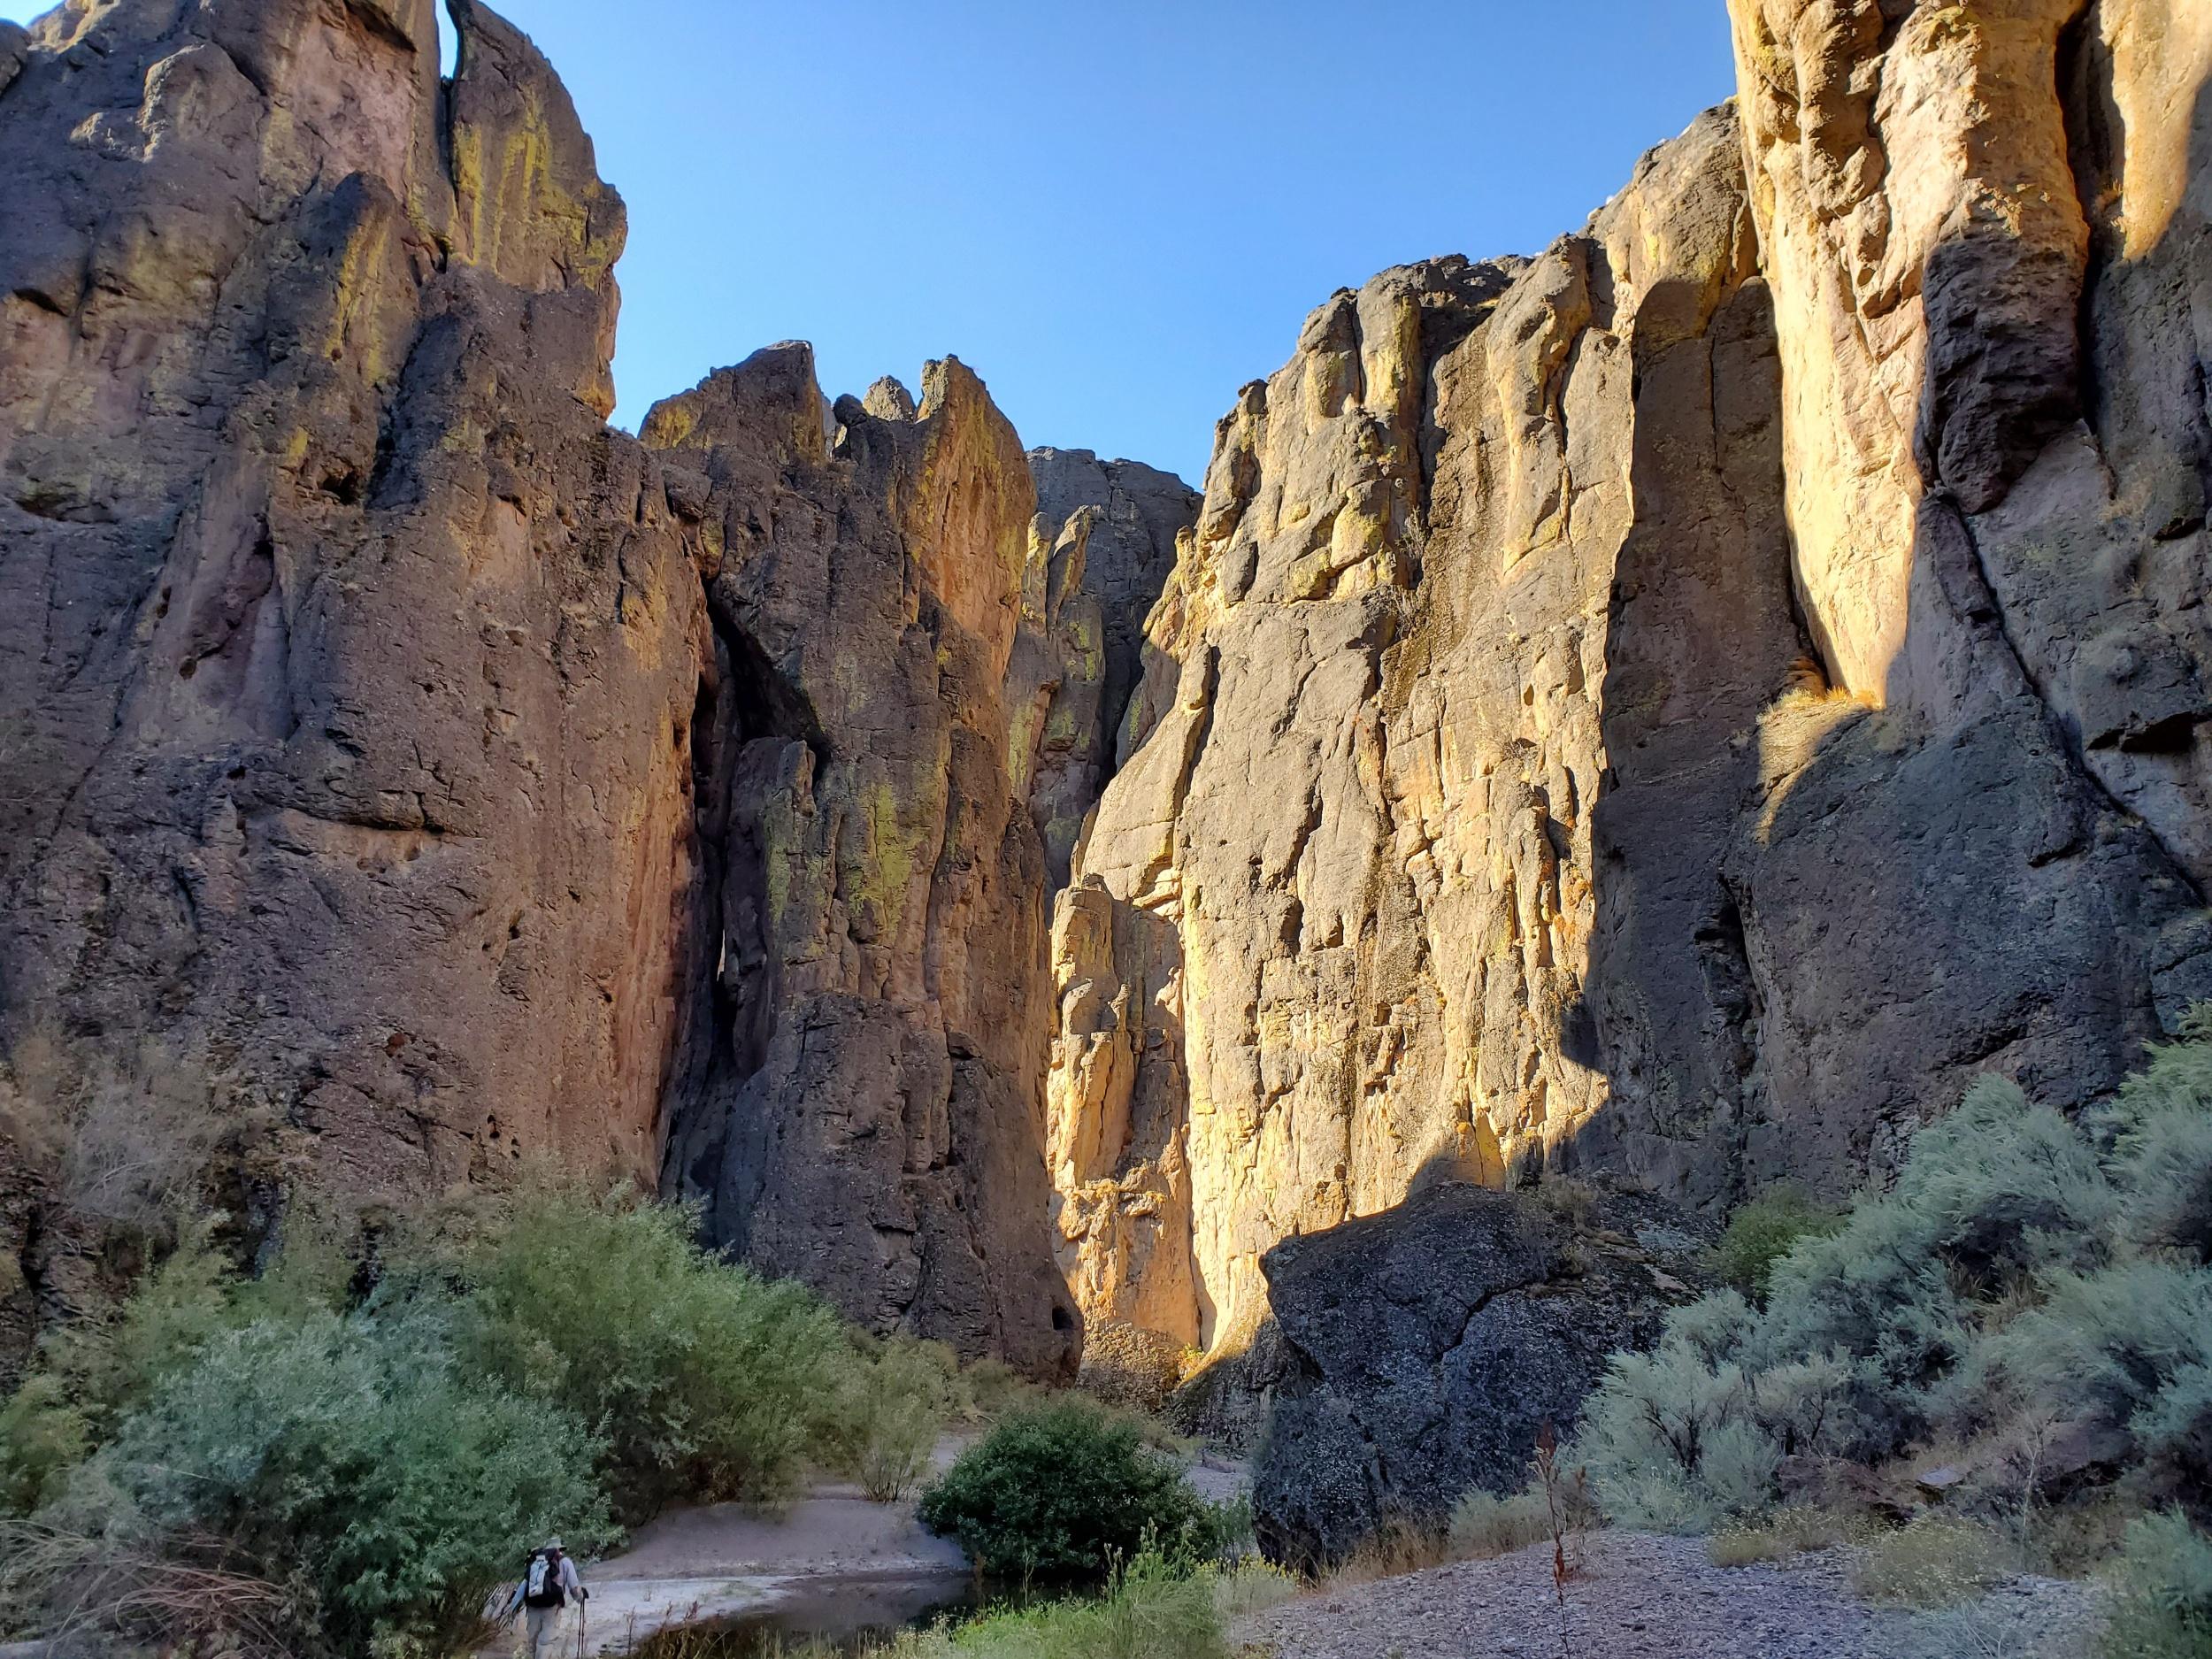 The dramatic canyon walls